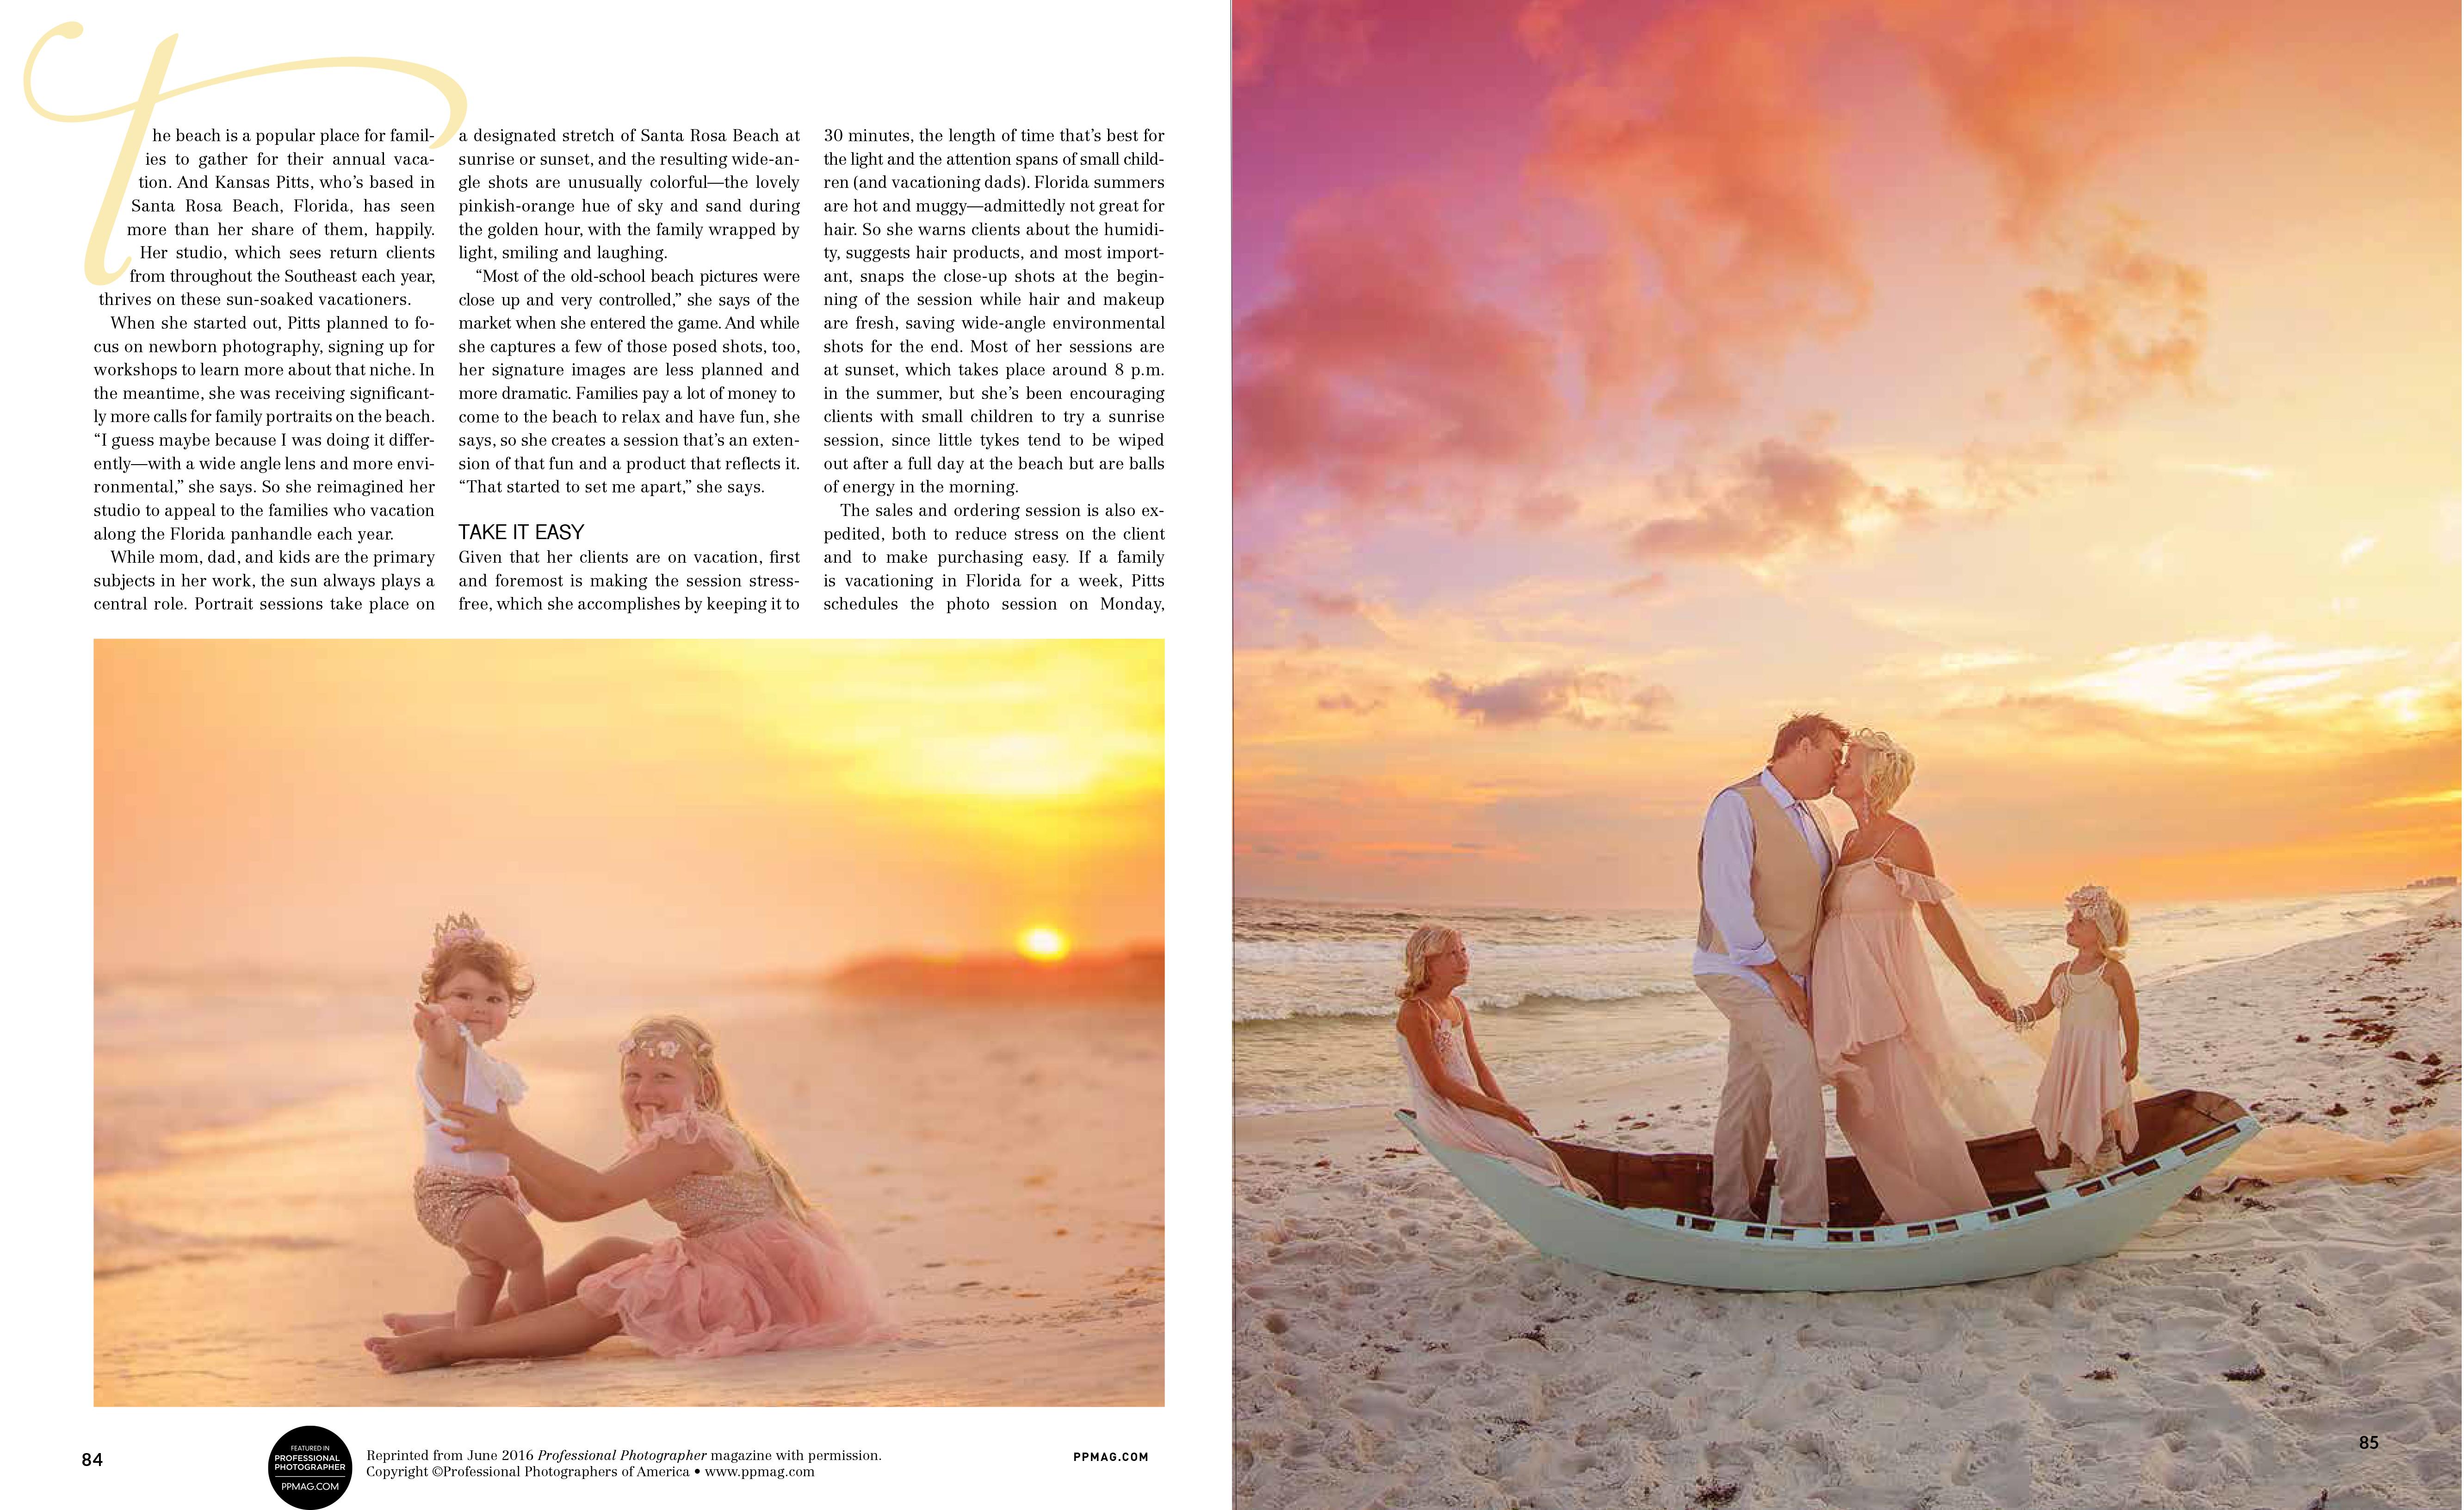 PPA_Magazine_FeaturePg8485